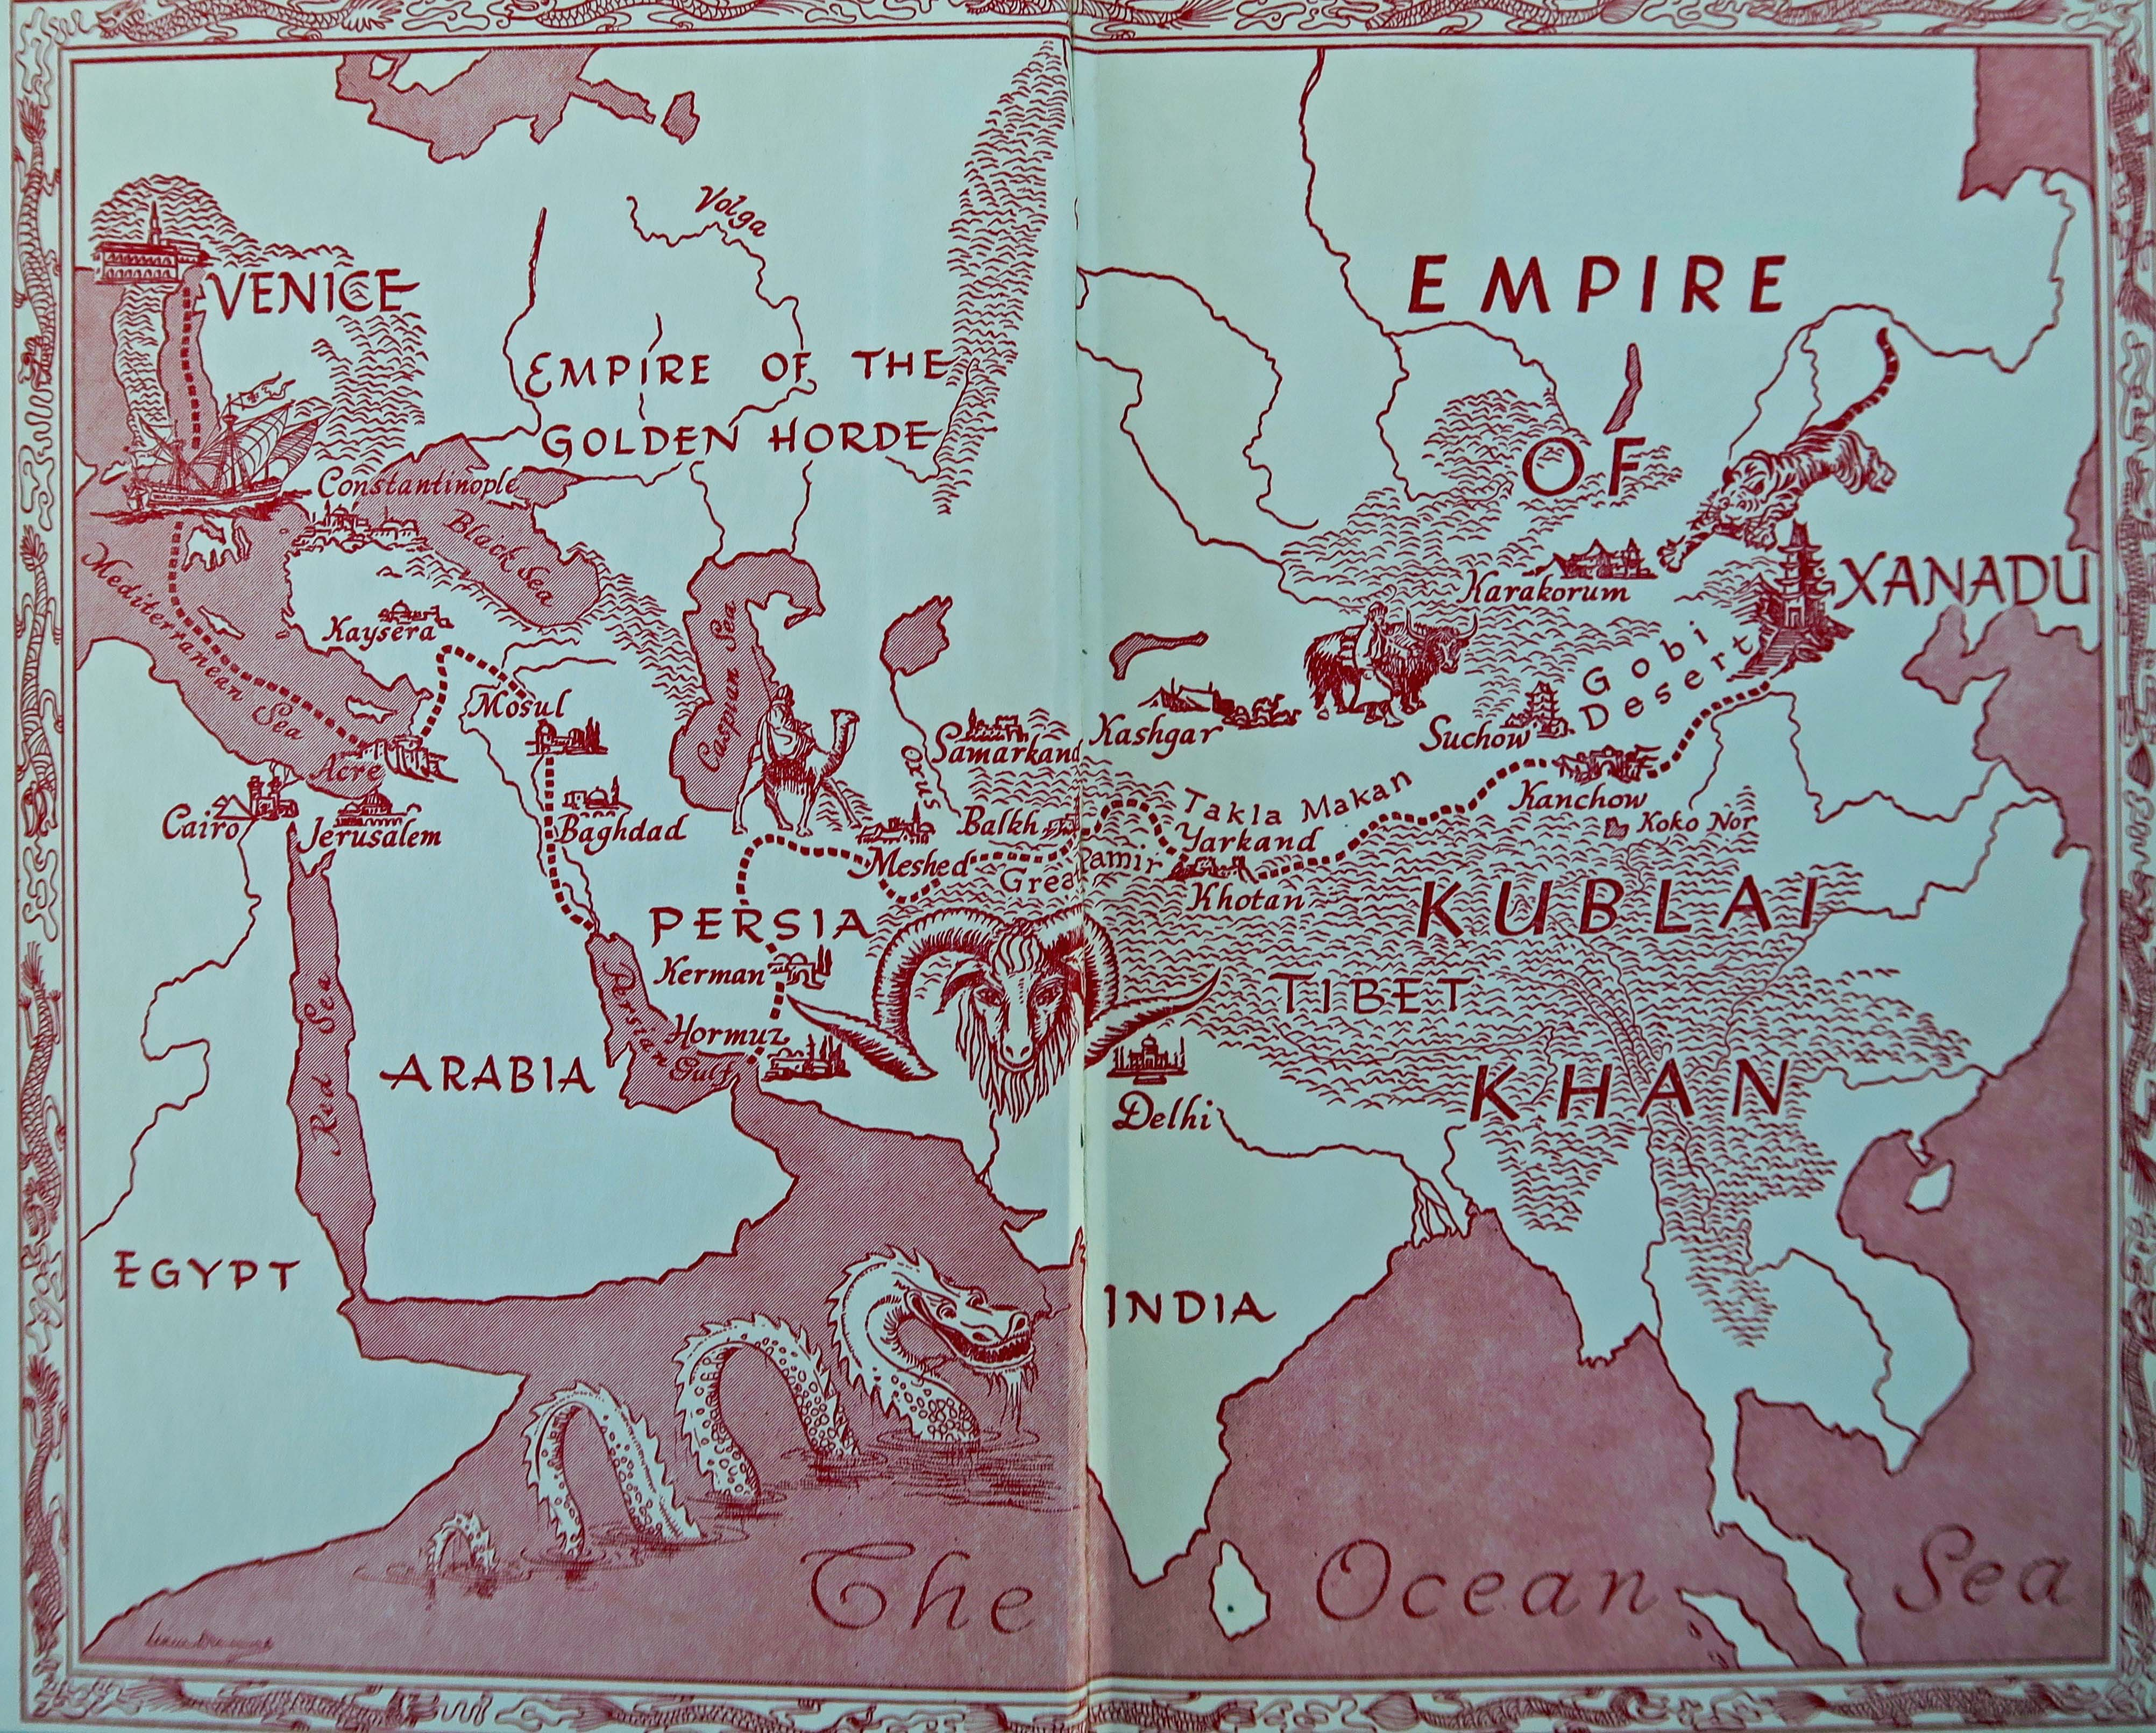 Map from Edison Marshall's book Caravan to Exanadu